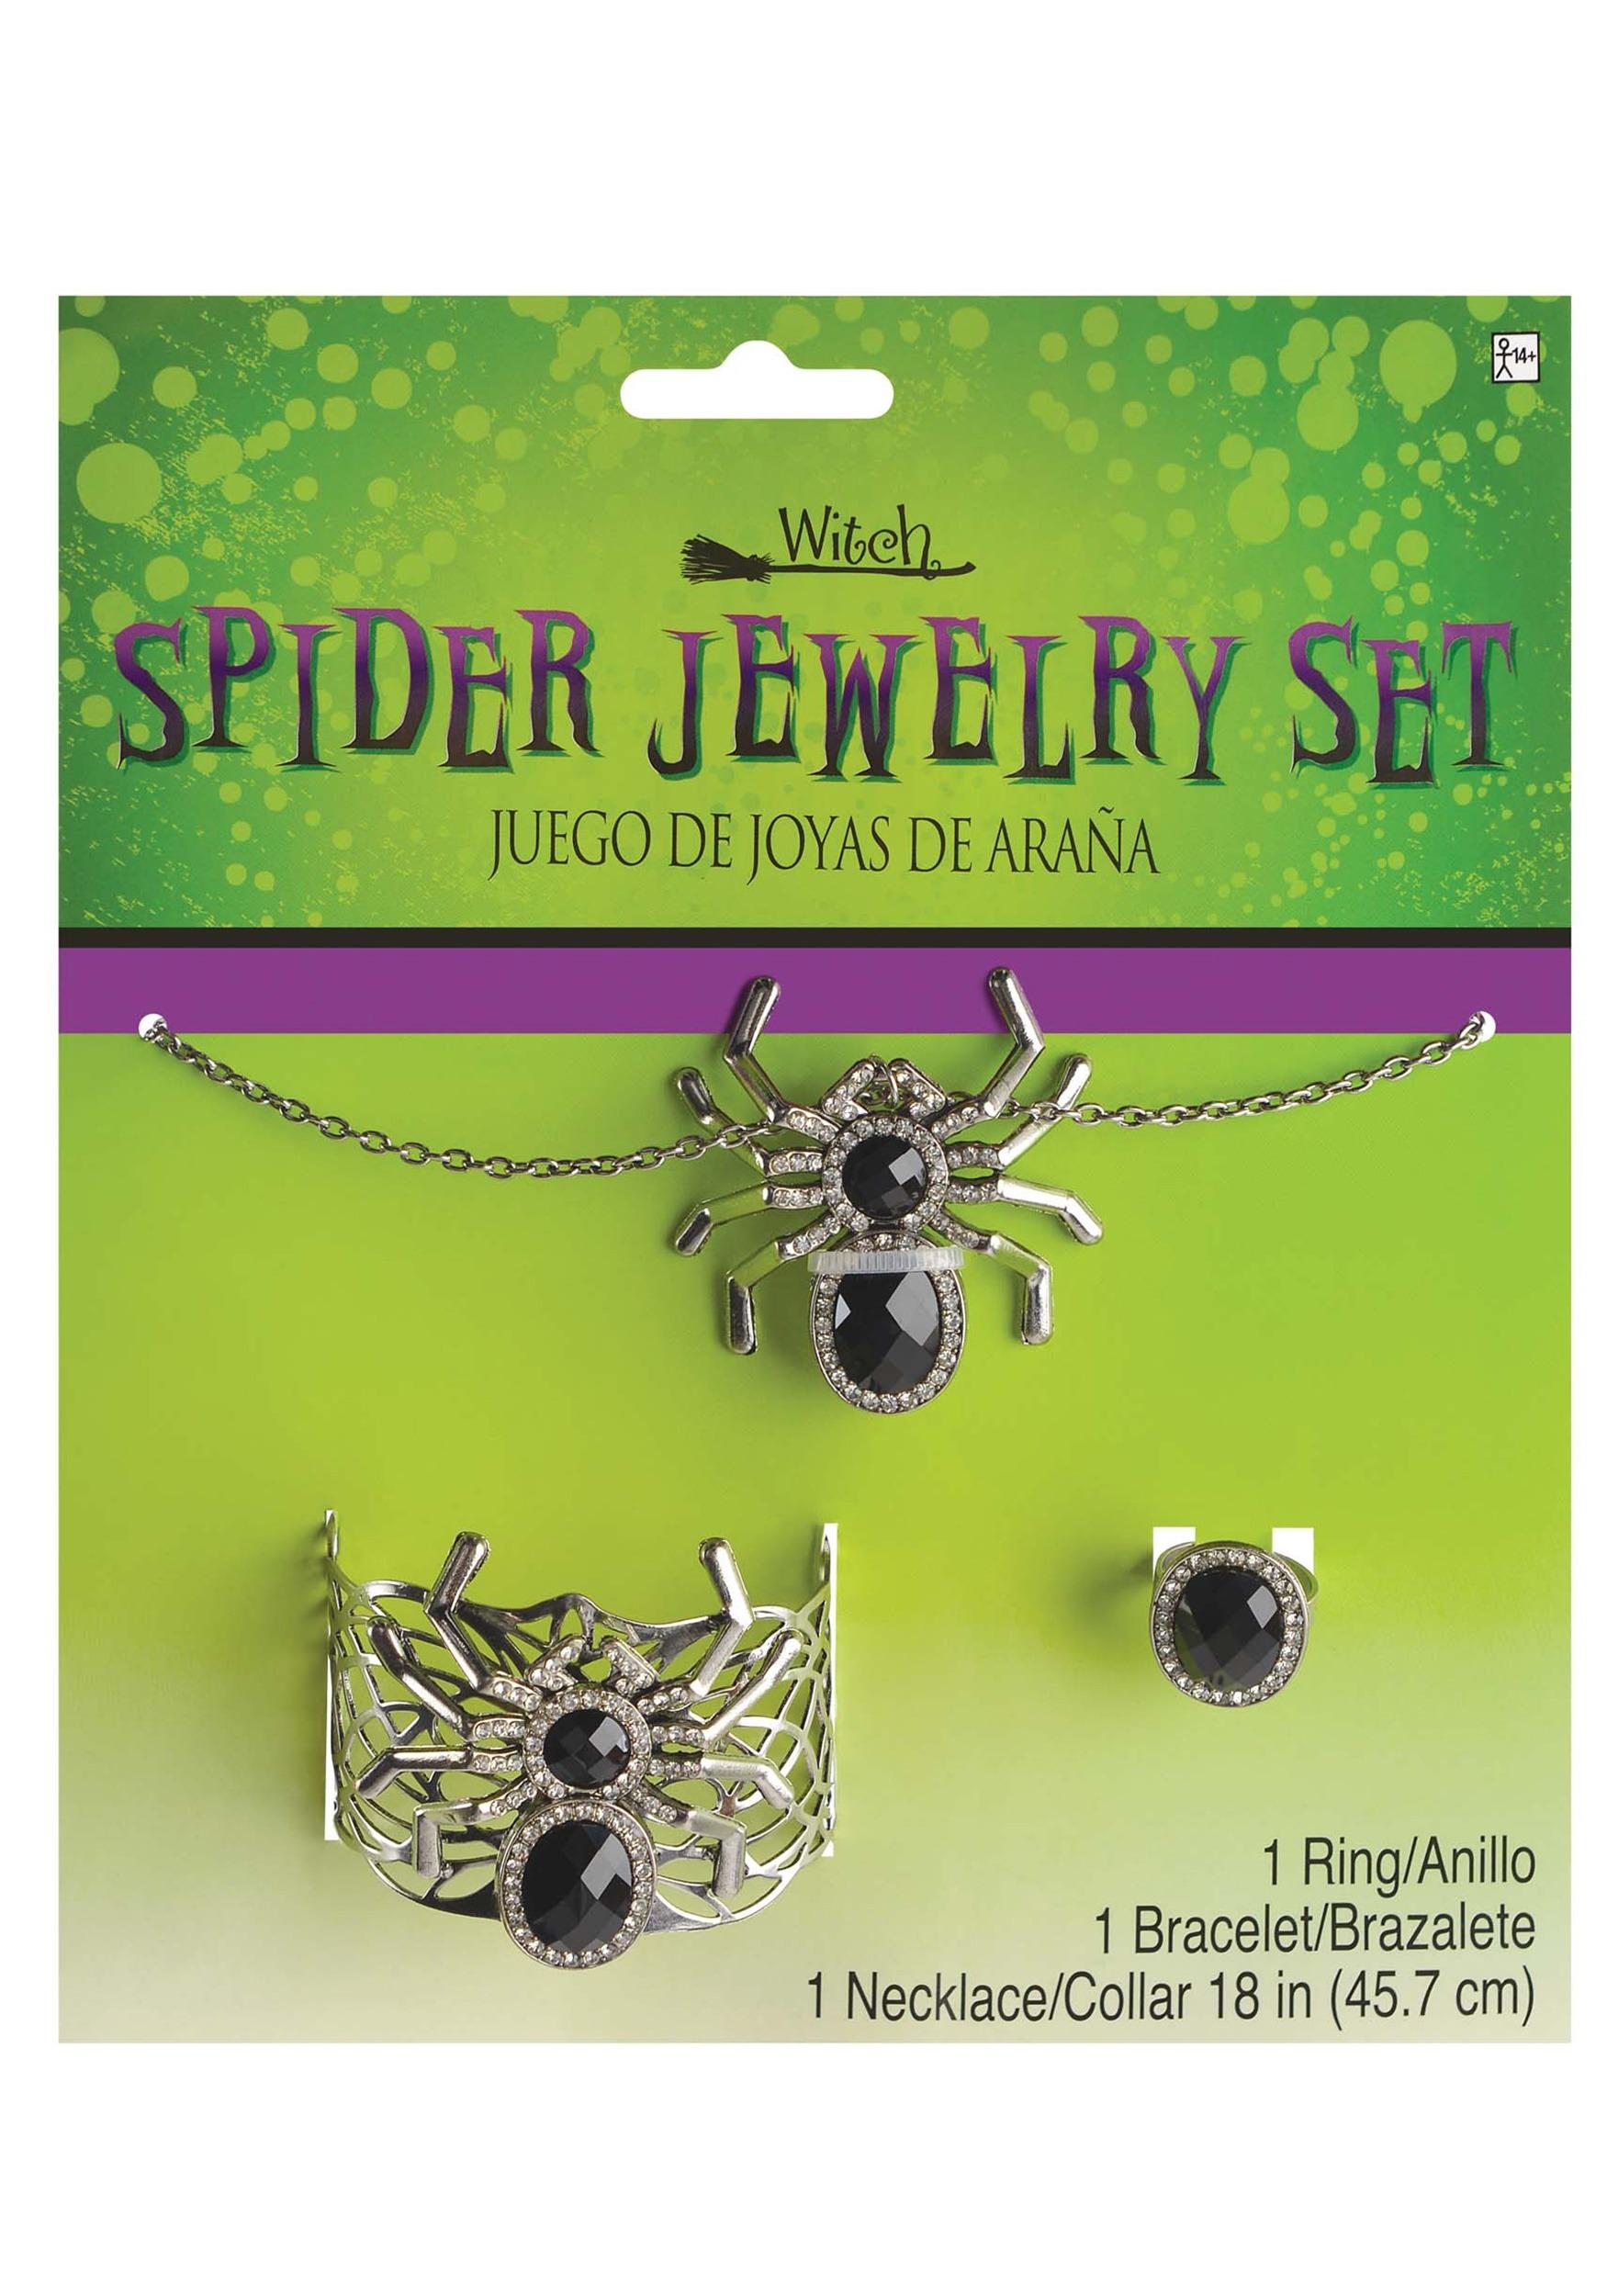 Gothic_Spider_Jewelry_Set